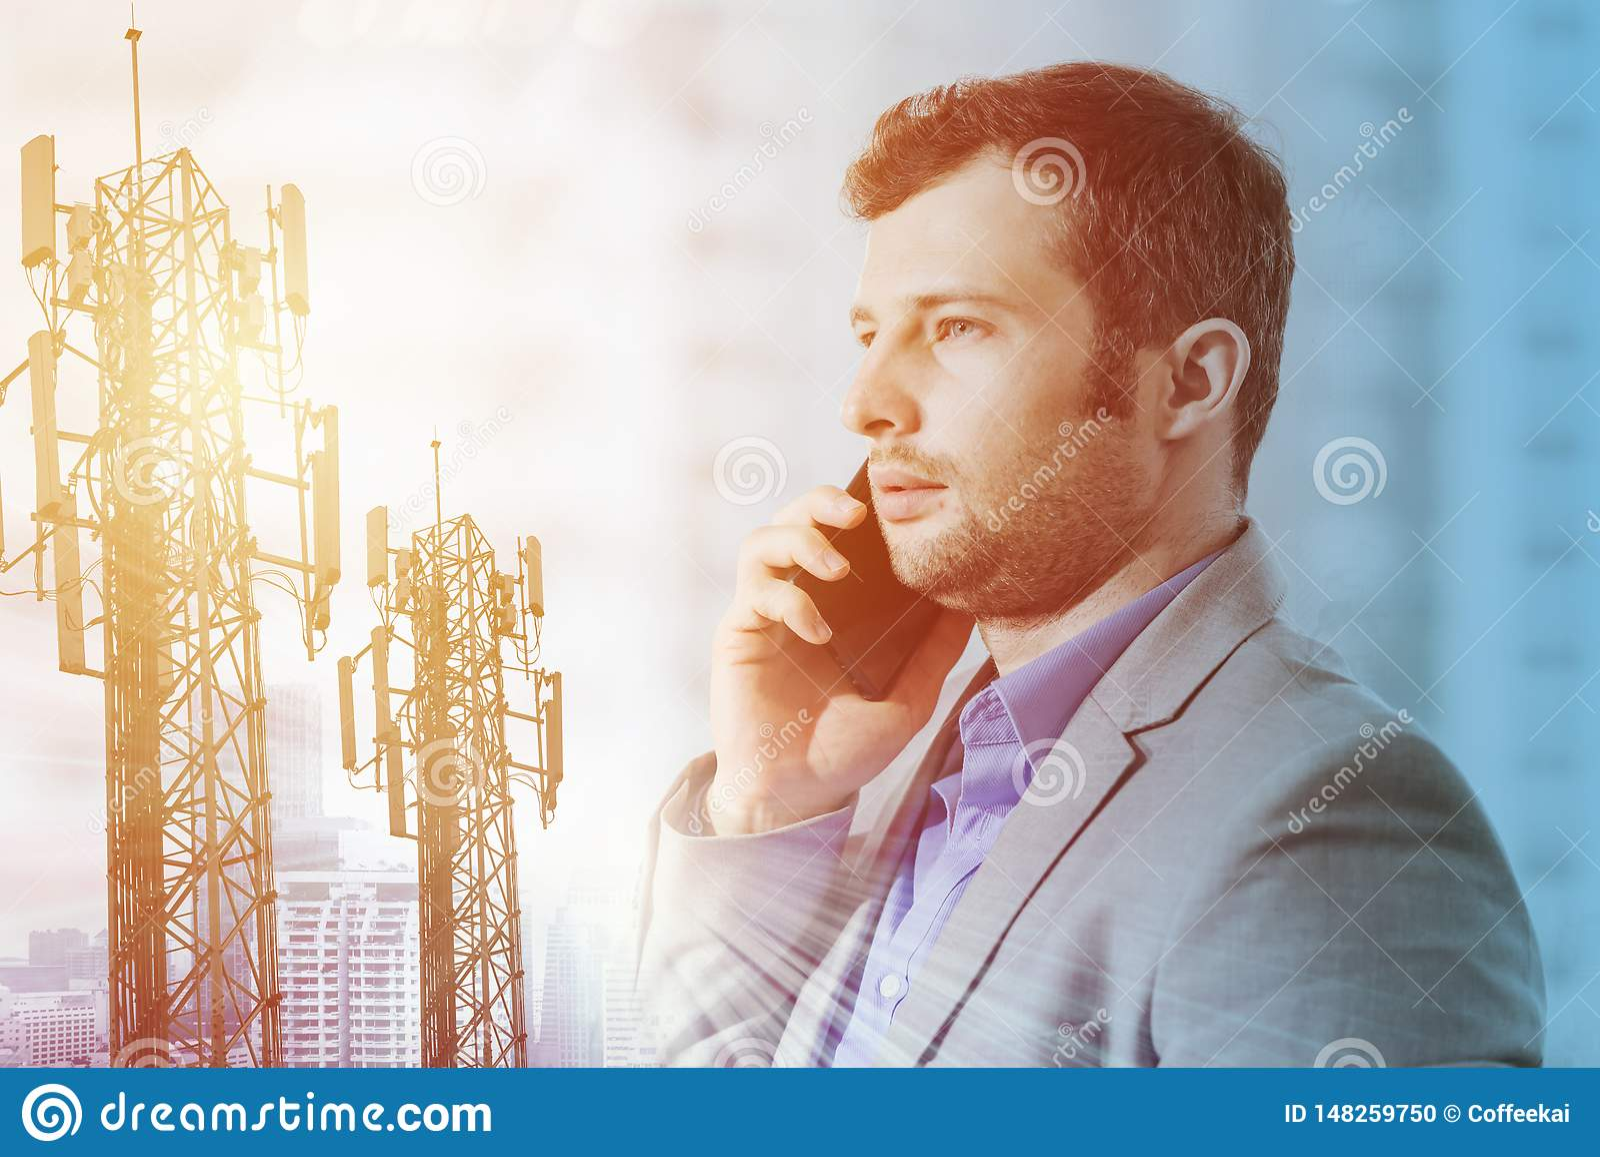 Busineesman on phone call for modern Telecommunication technology